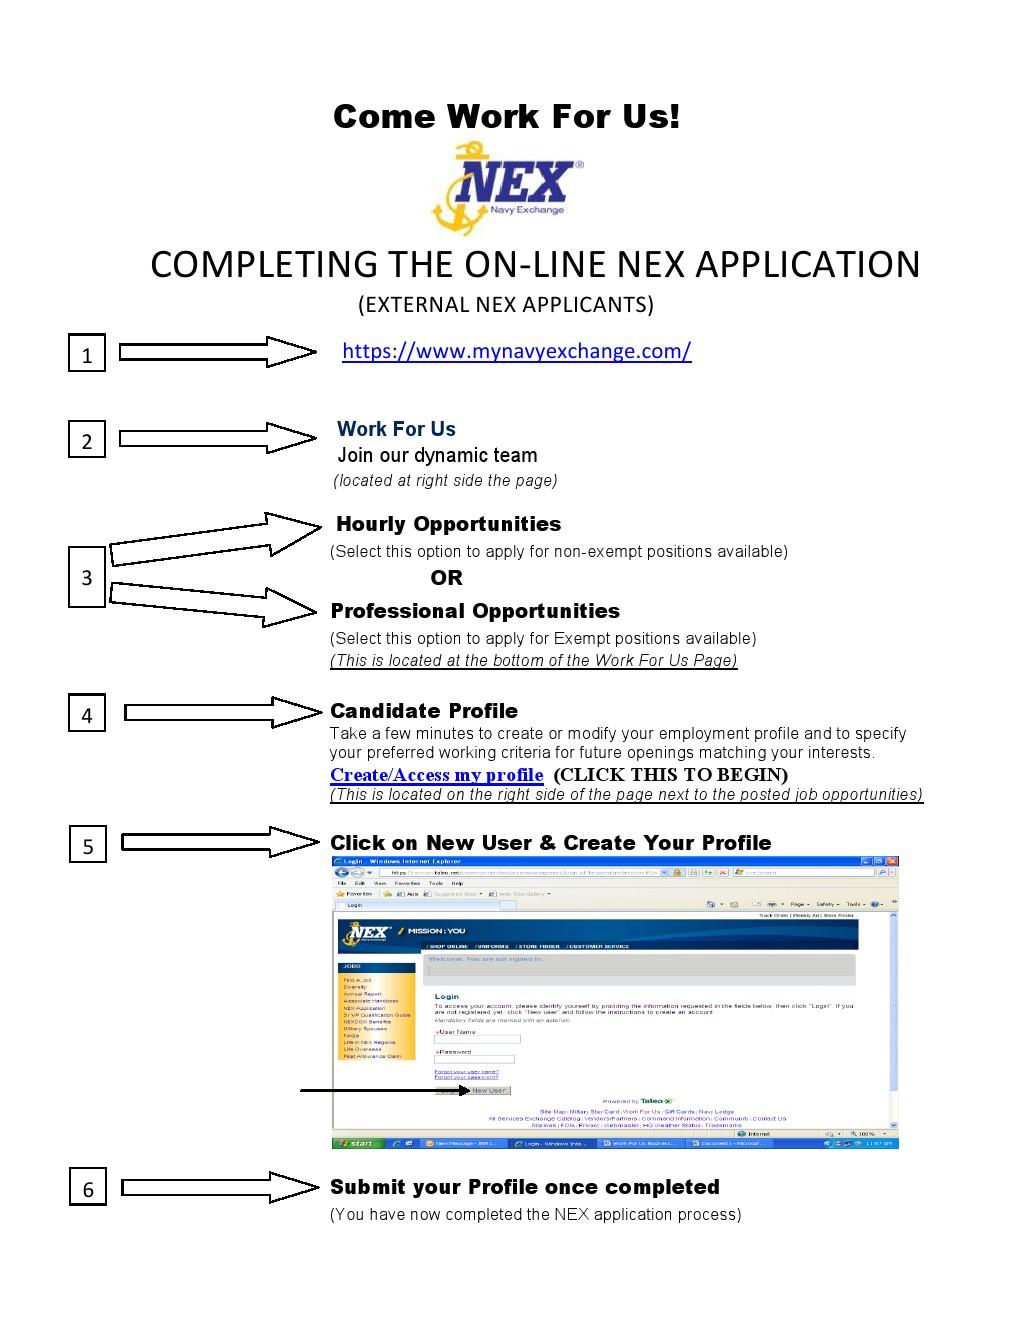 navy exchange job openings job career news from the